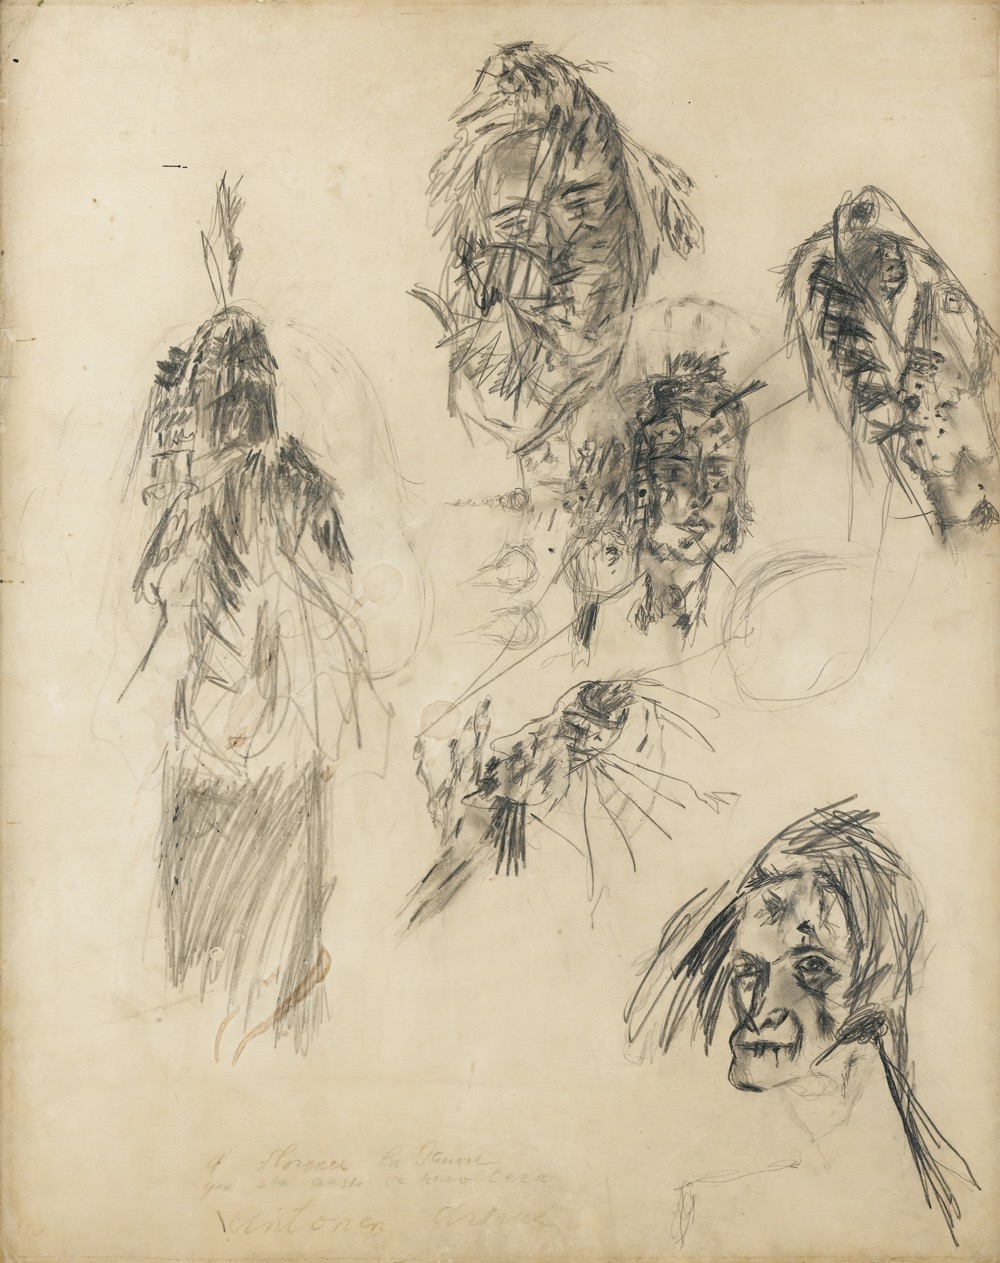 Винсент Ван Гог. Канал Рубин дю Руа. 1888. Частная коллекция